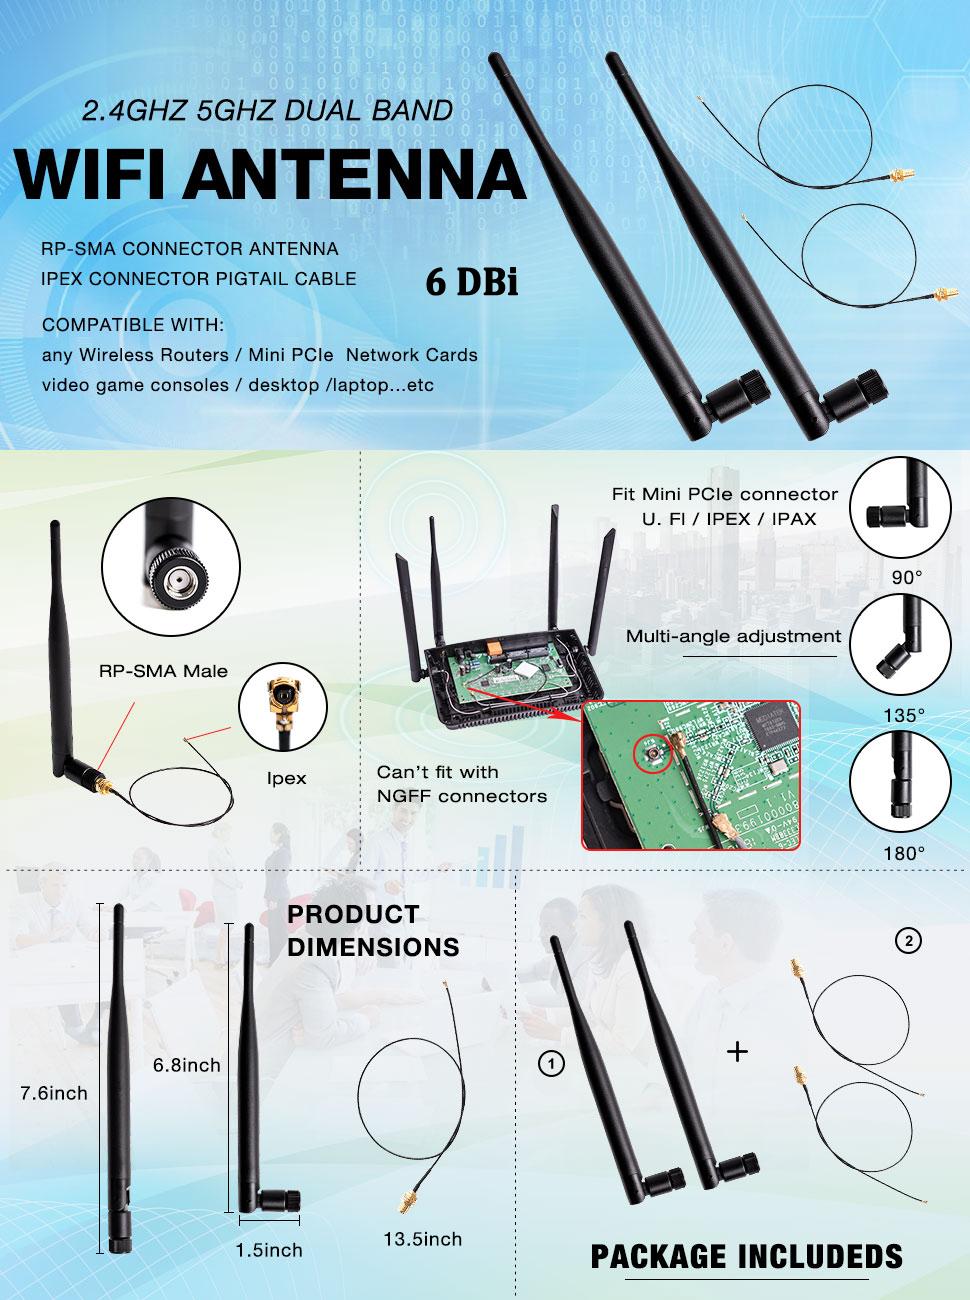 Long Range WiFi Antenna | Best WiFi Antennas 2019 - RootSaid